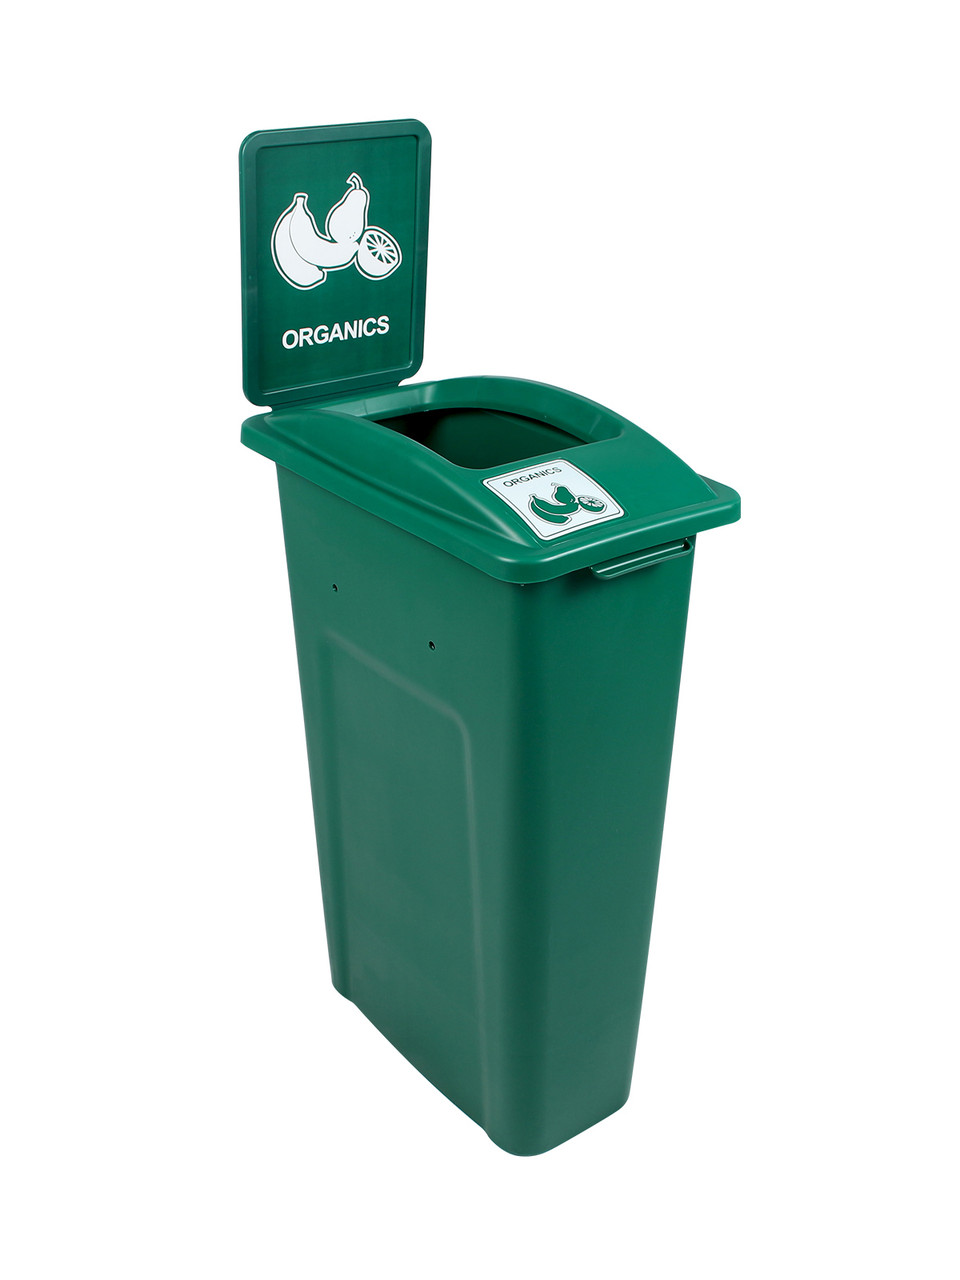 23 Gallon Skinny Simple Sort Compost Bin with Sign (Open Top, Organics)